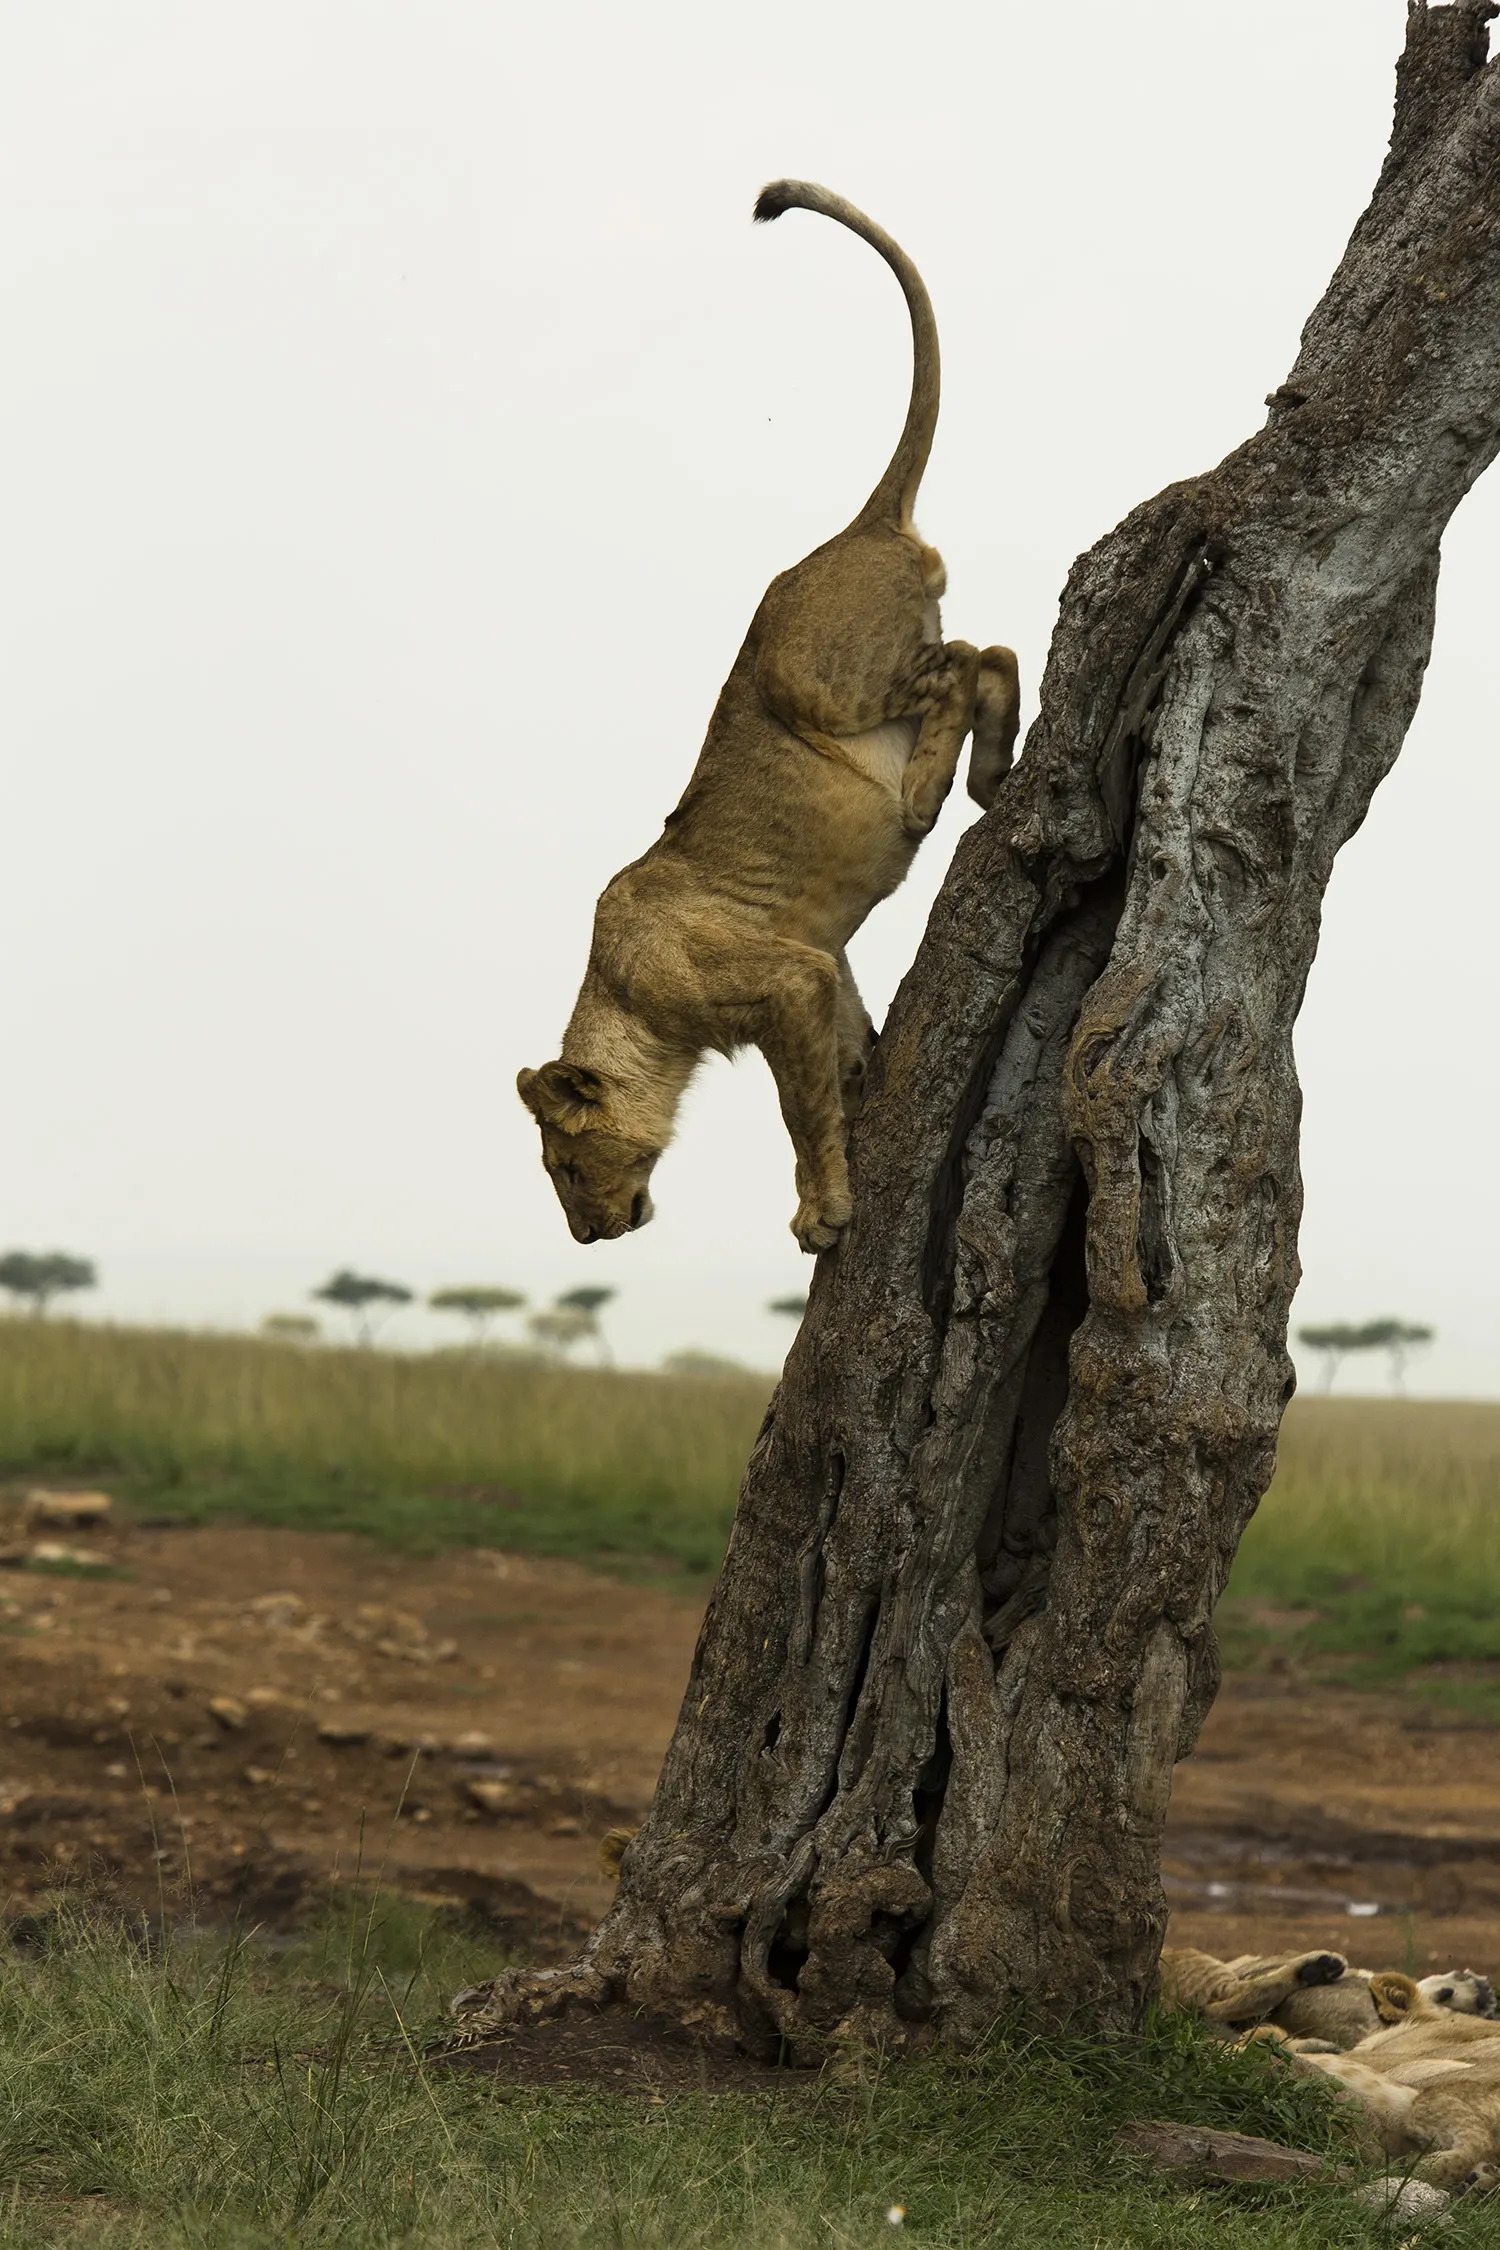 Angama pride cub comes down tree